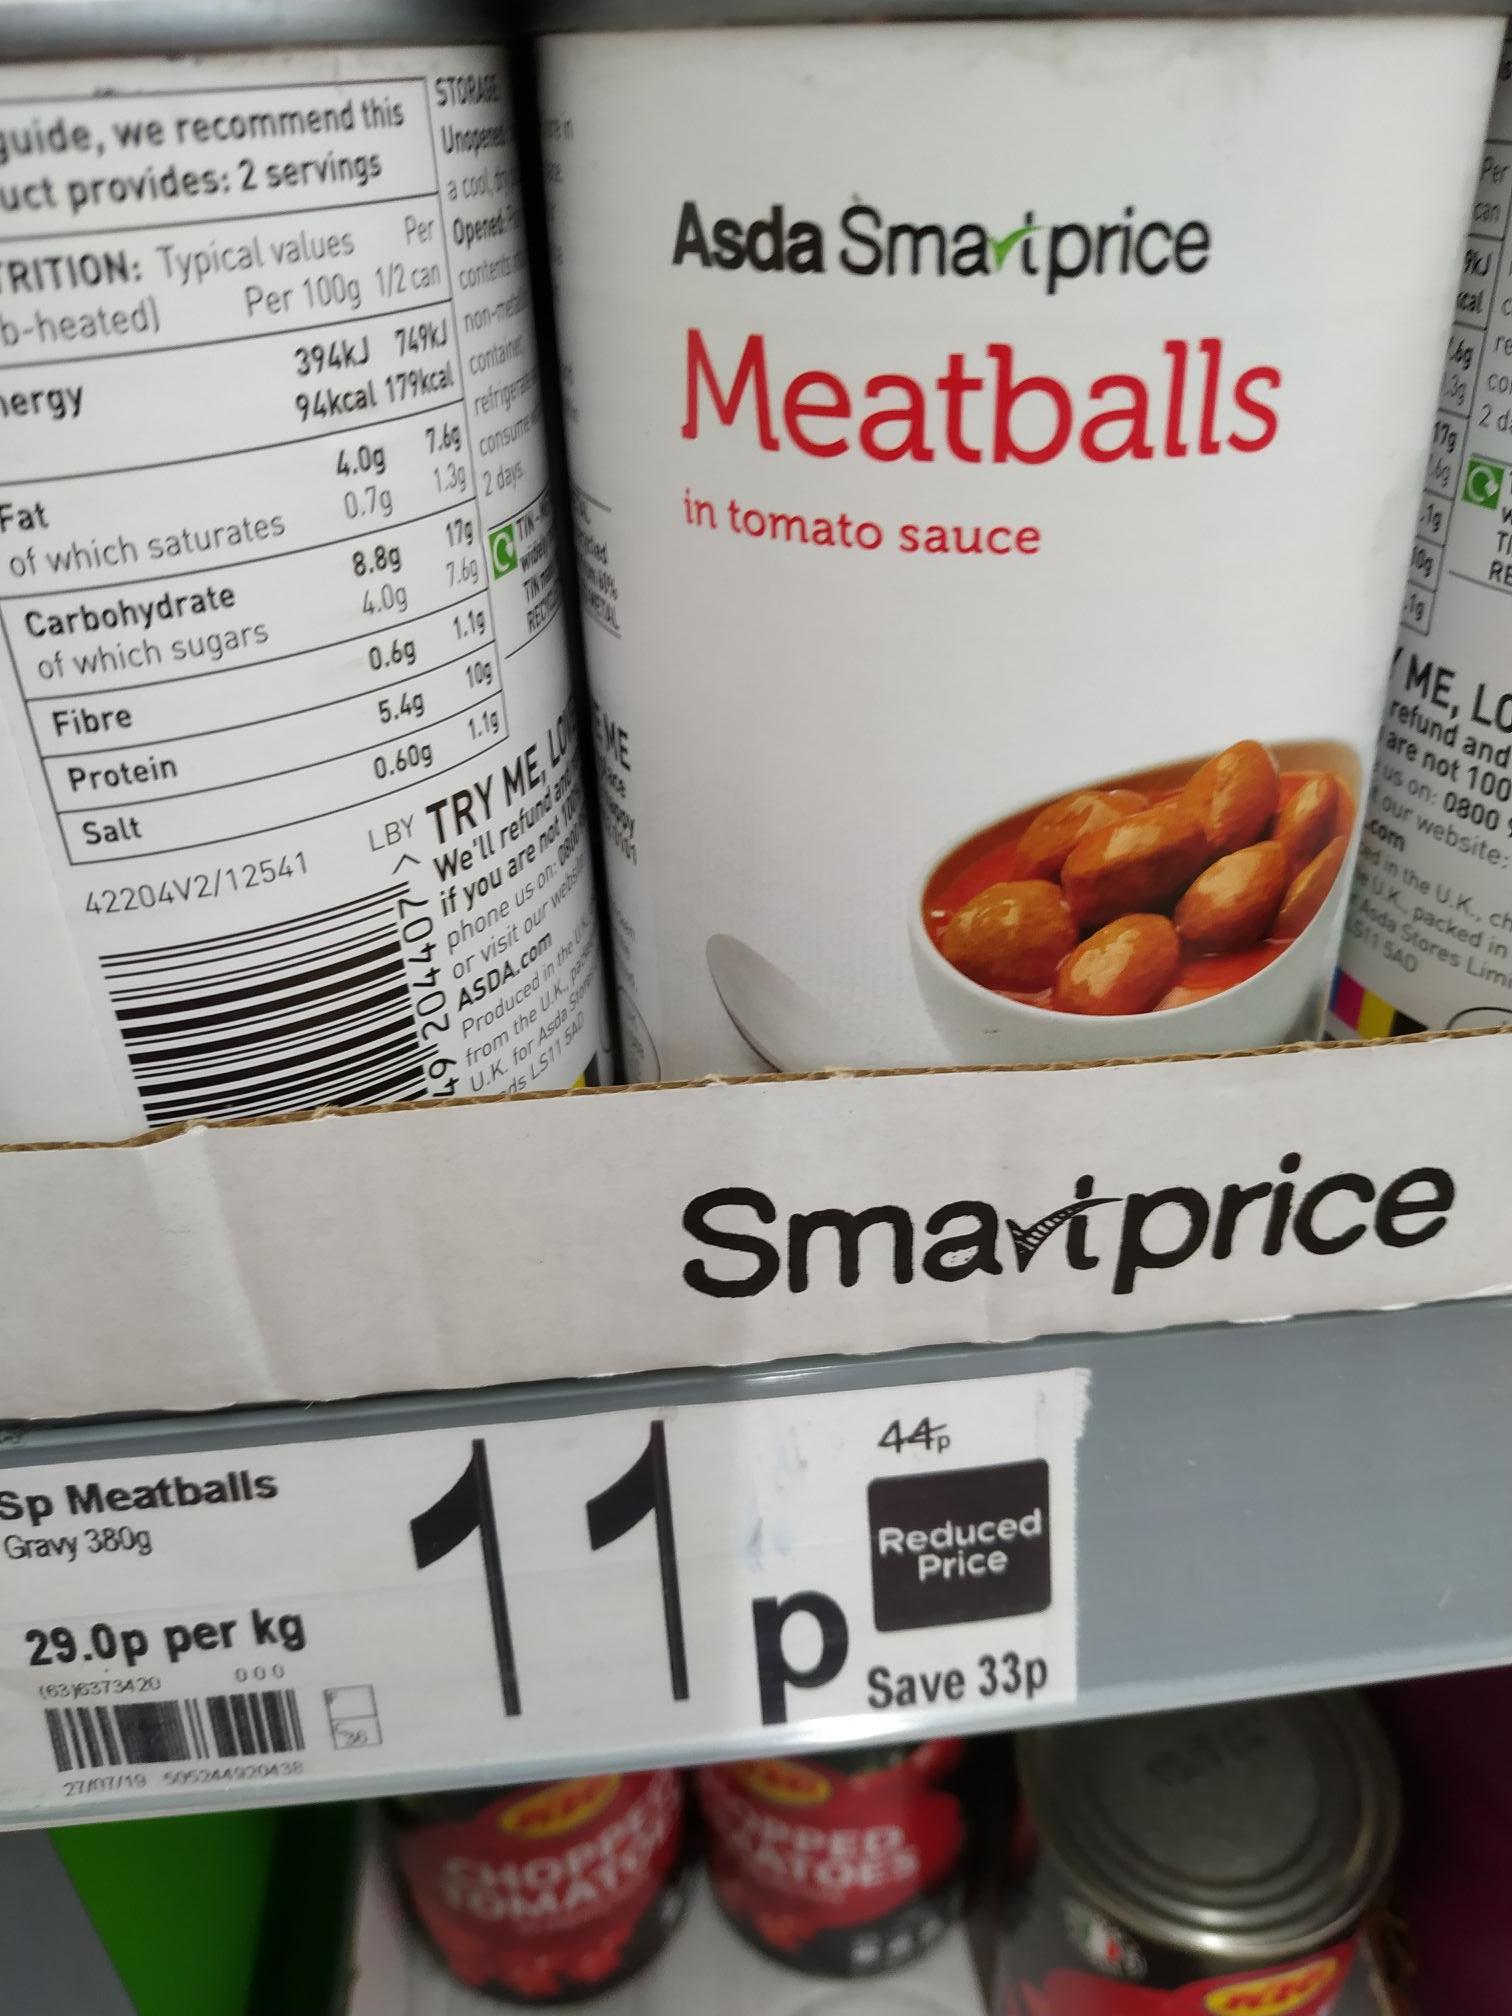 Asda Smartprice Meatballs 11p At Asda Instore Hotukdeals